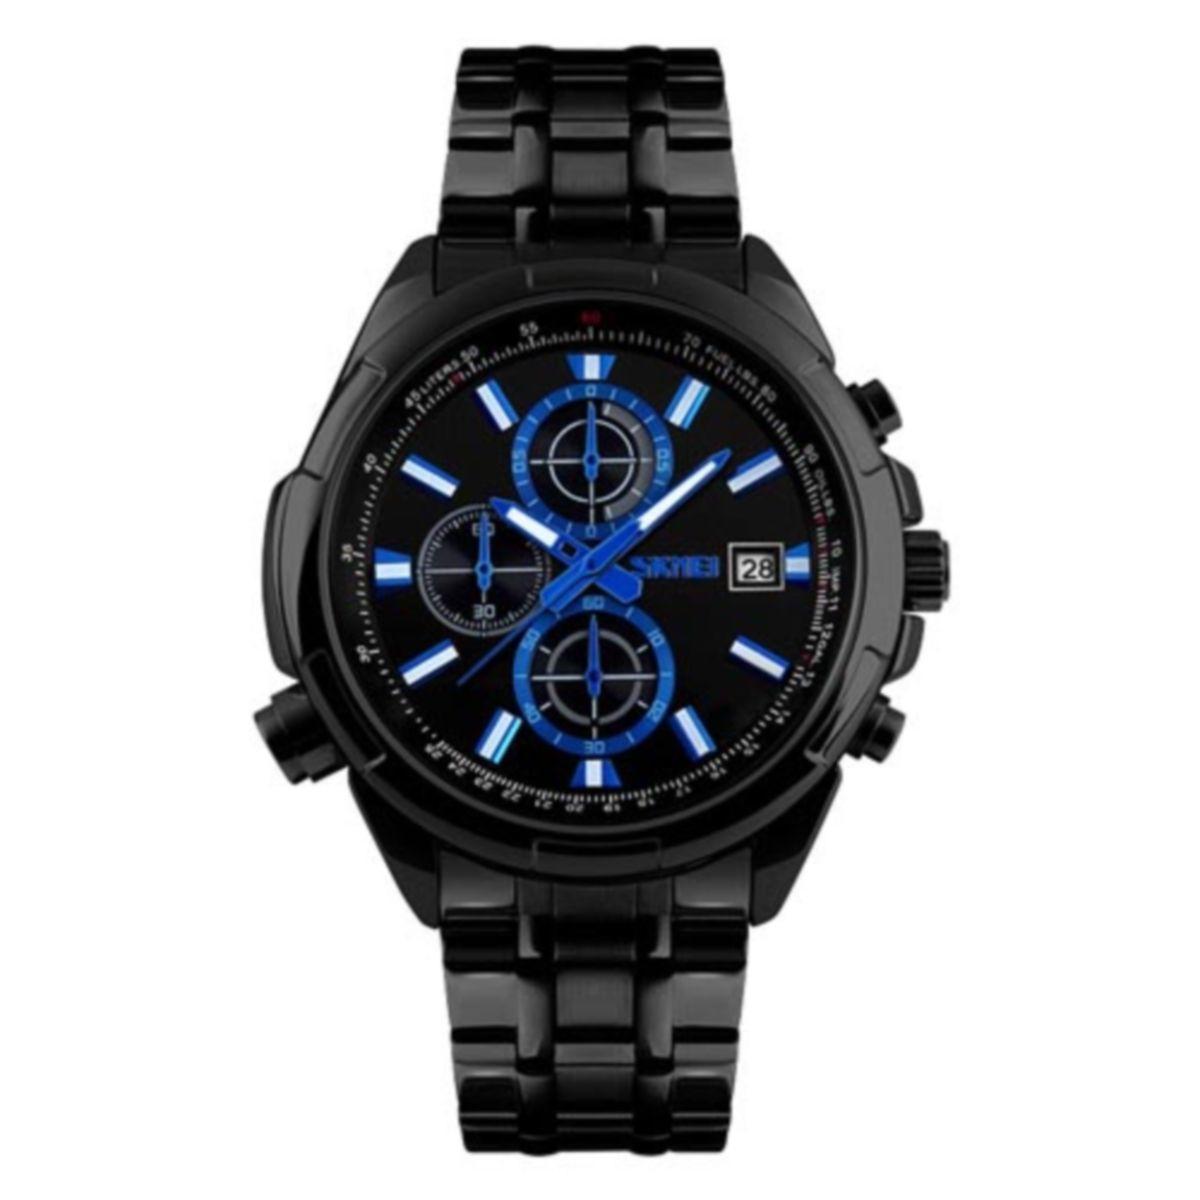 Часы Skmei 9107 Black Black Dail BOX (9107BOXBKBK)